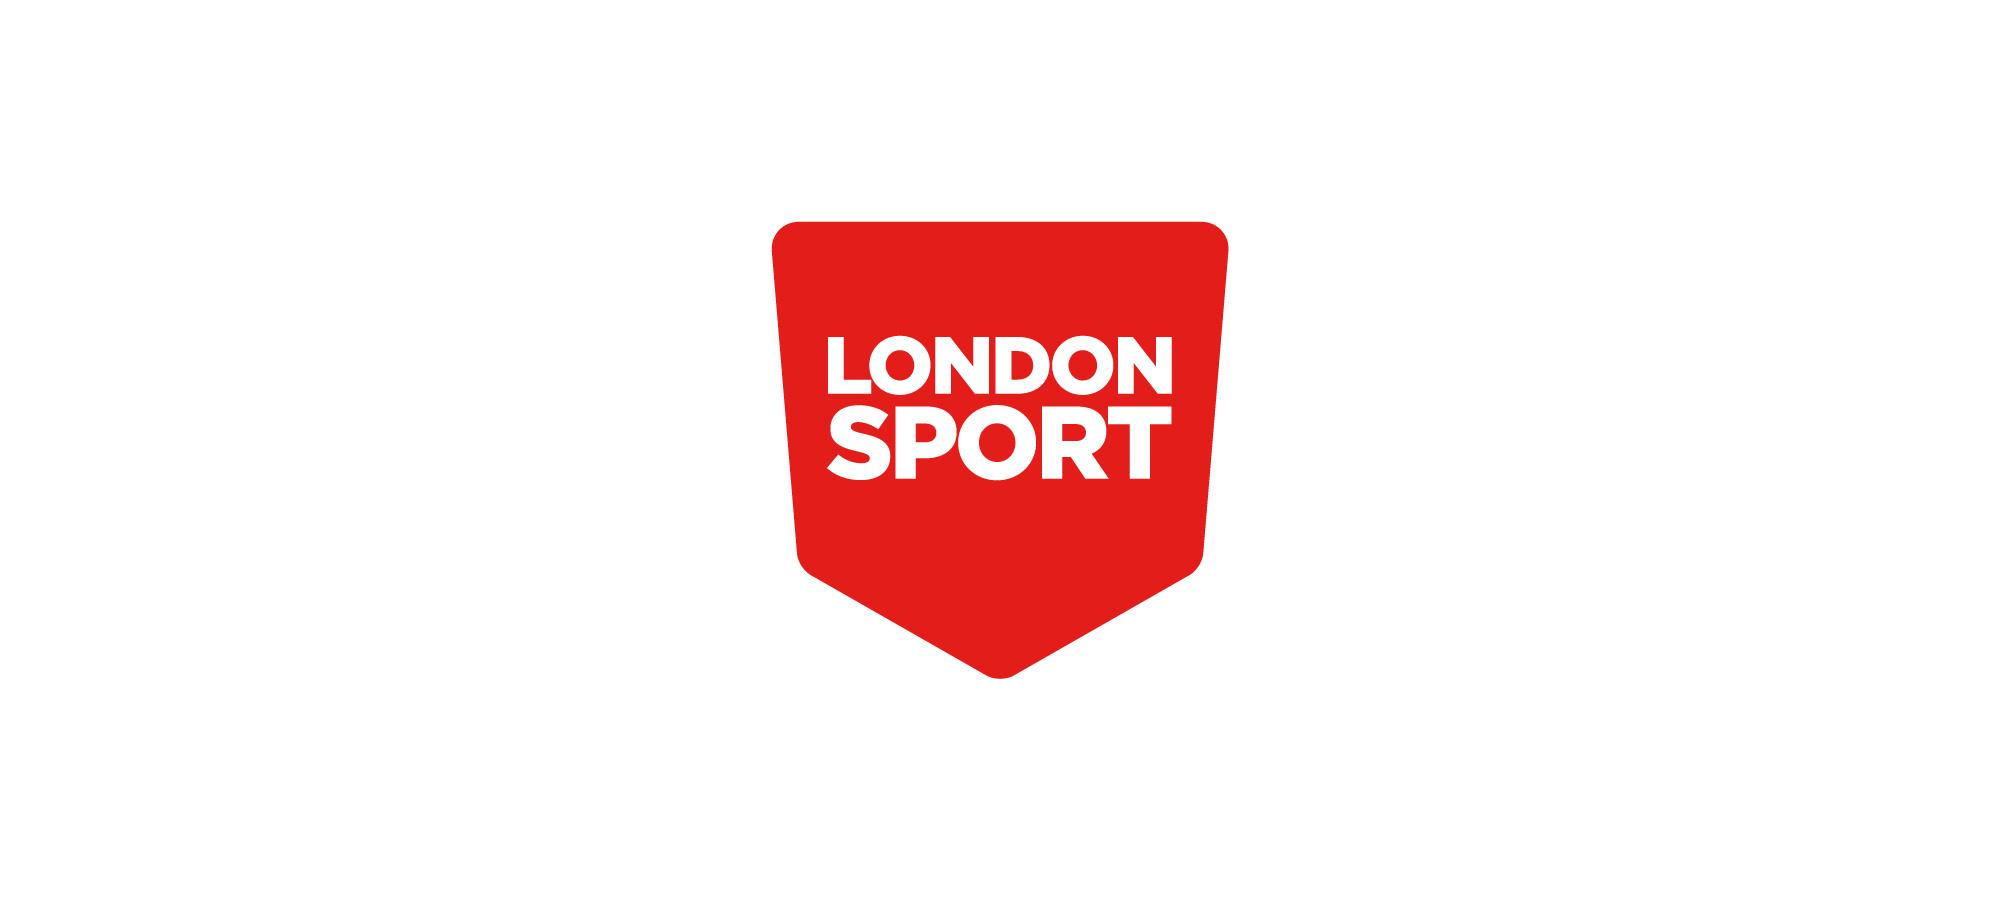 London Sport Identity Design 38one